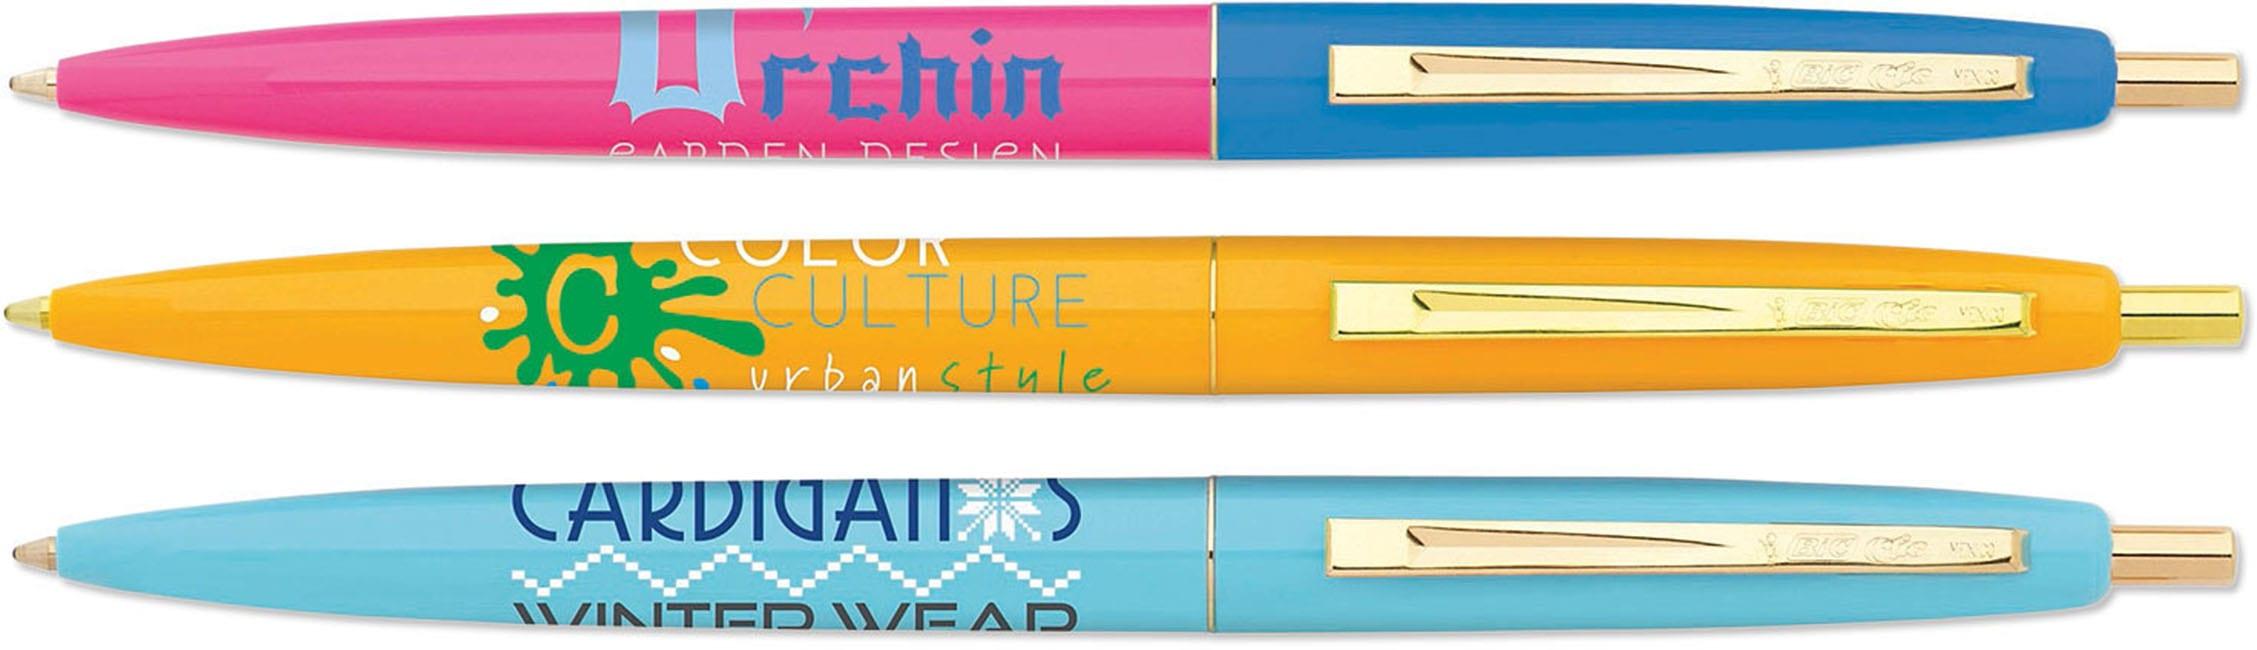 BIC Clic Gold Pen